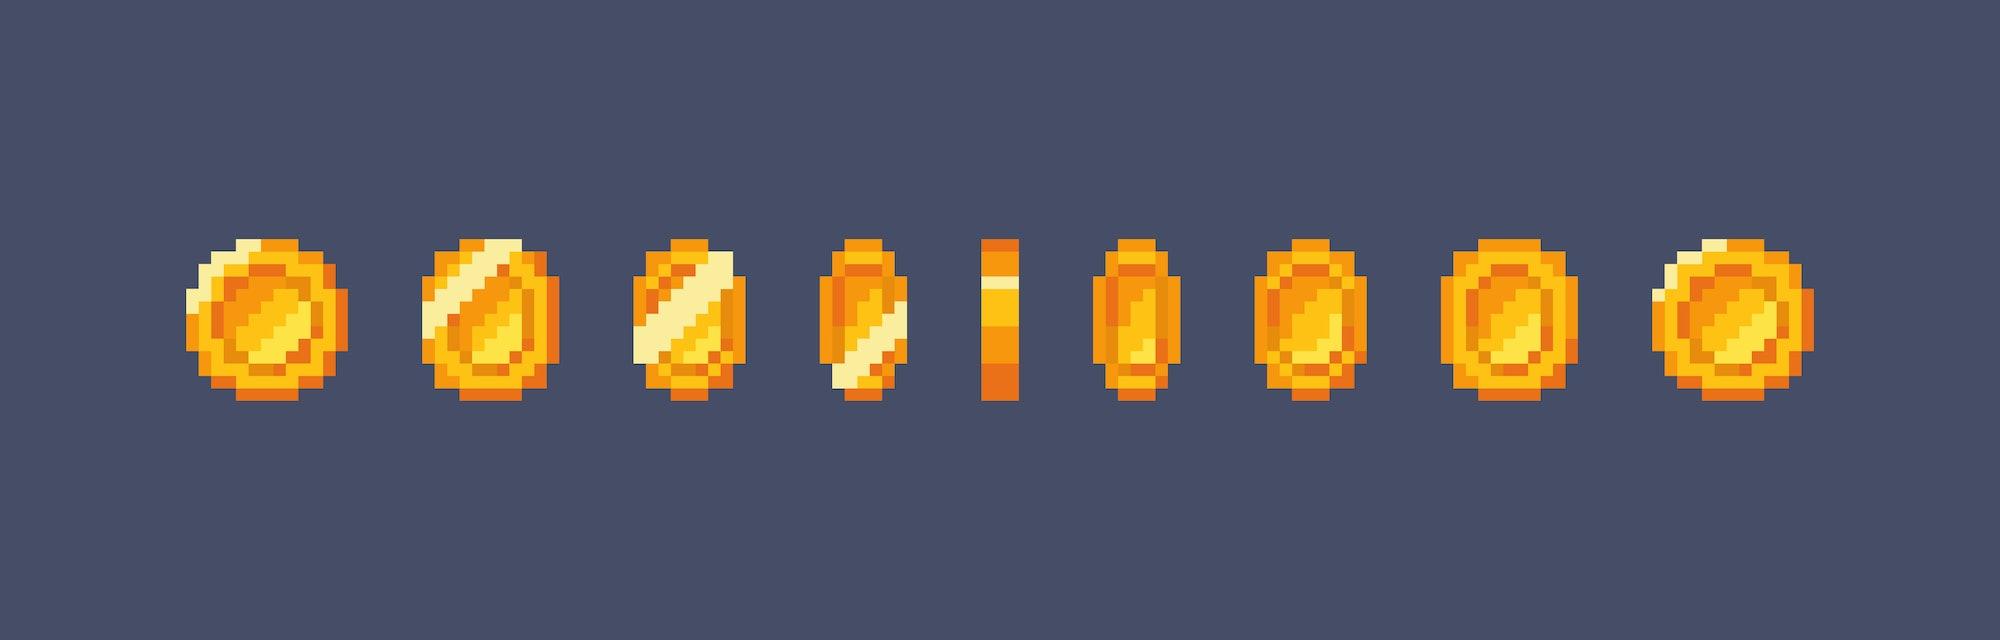 Pixel art gold coin animation. Vector illustration